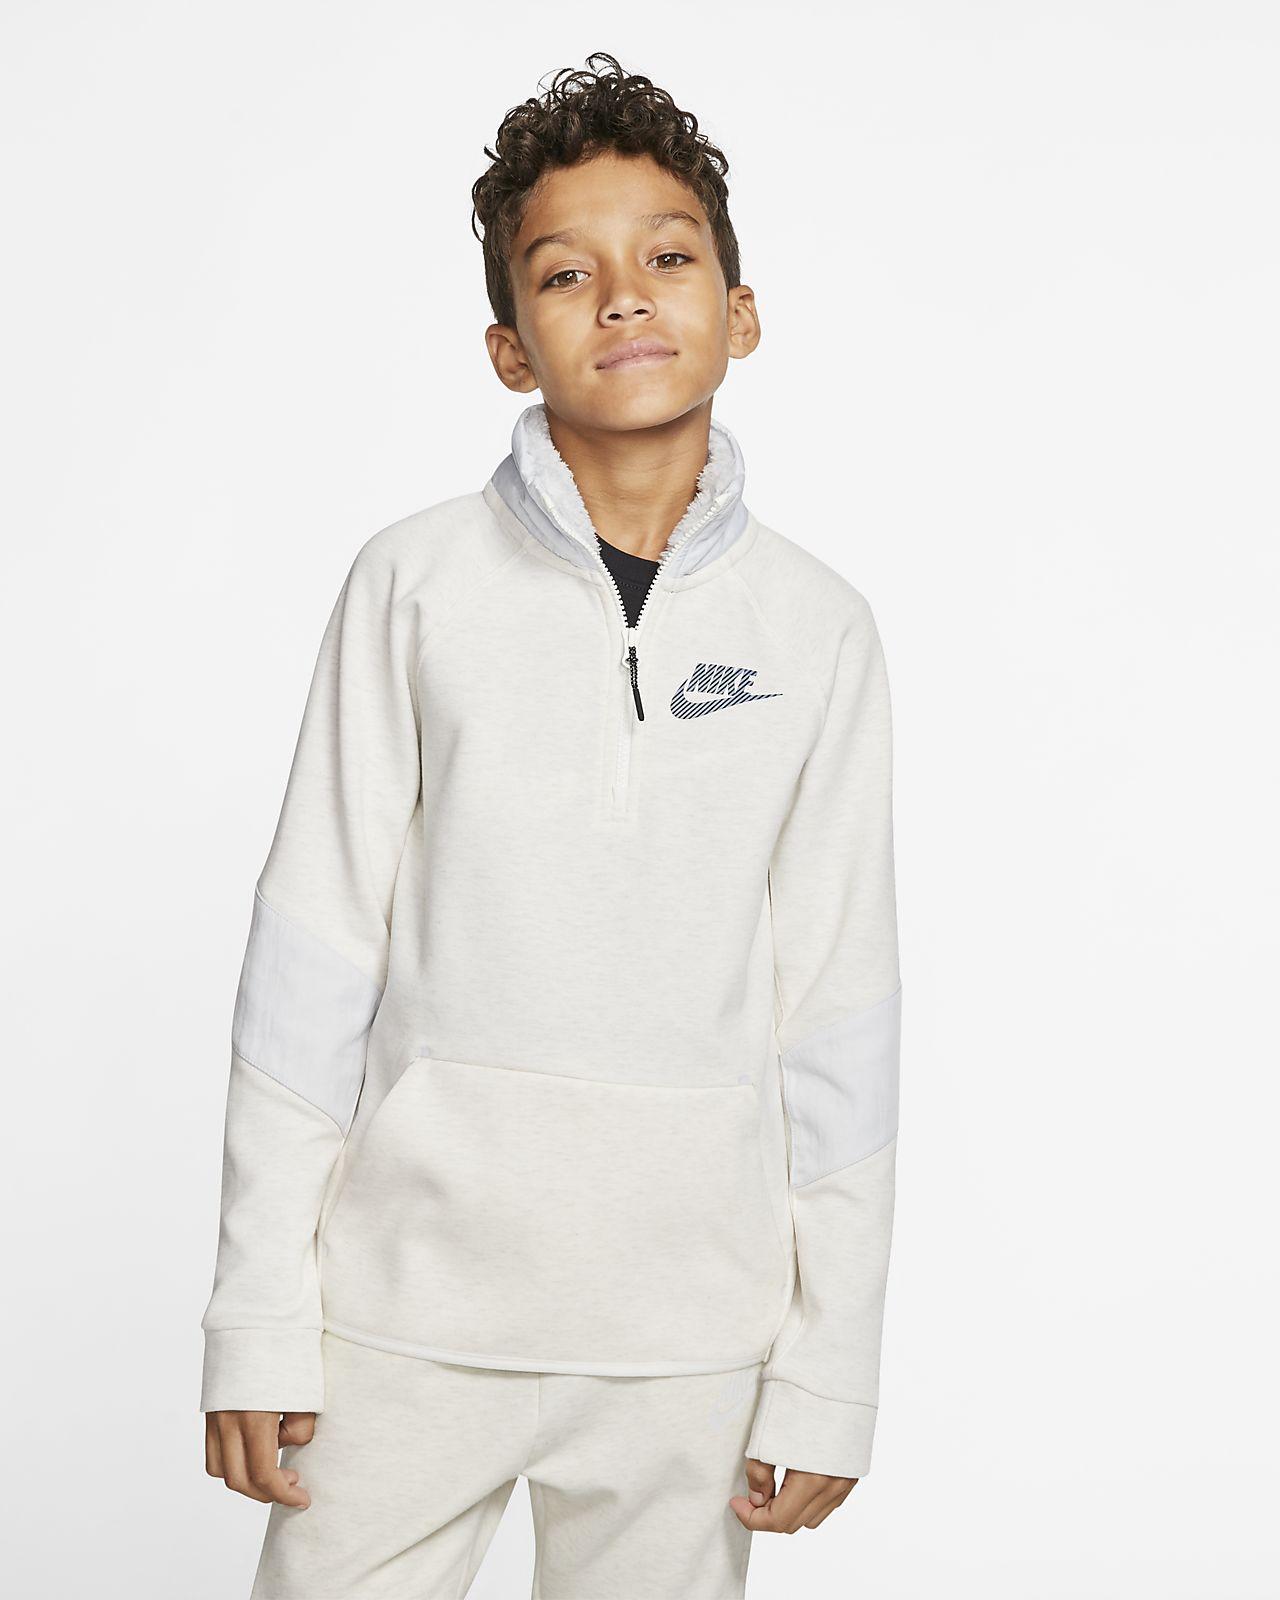 Nike Sportswear Winterized Tech Fleece Camiseta de manga larga - Niño/a